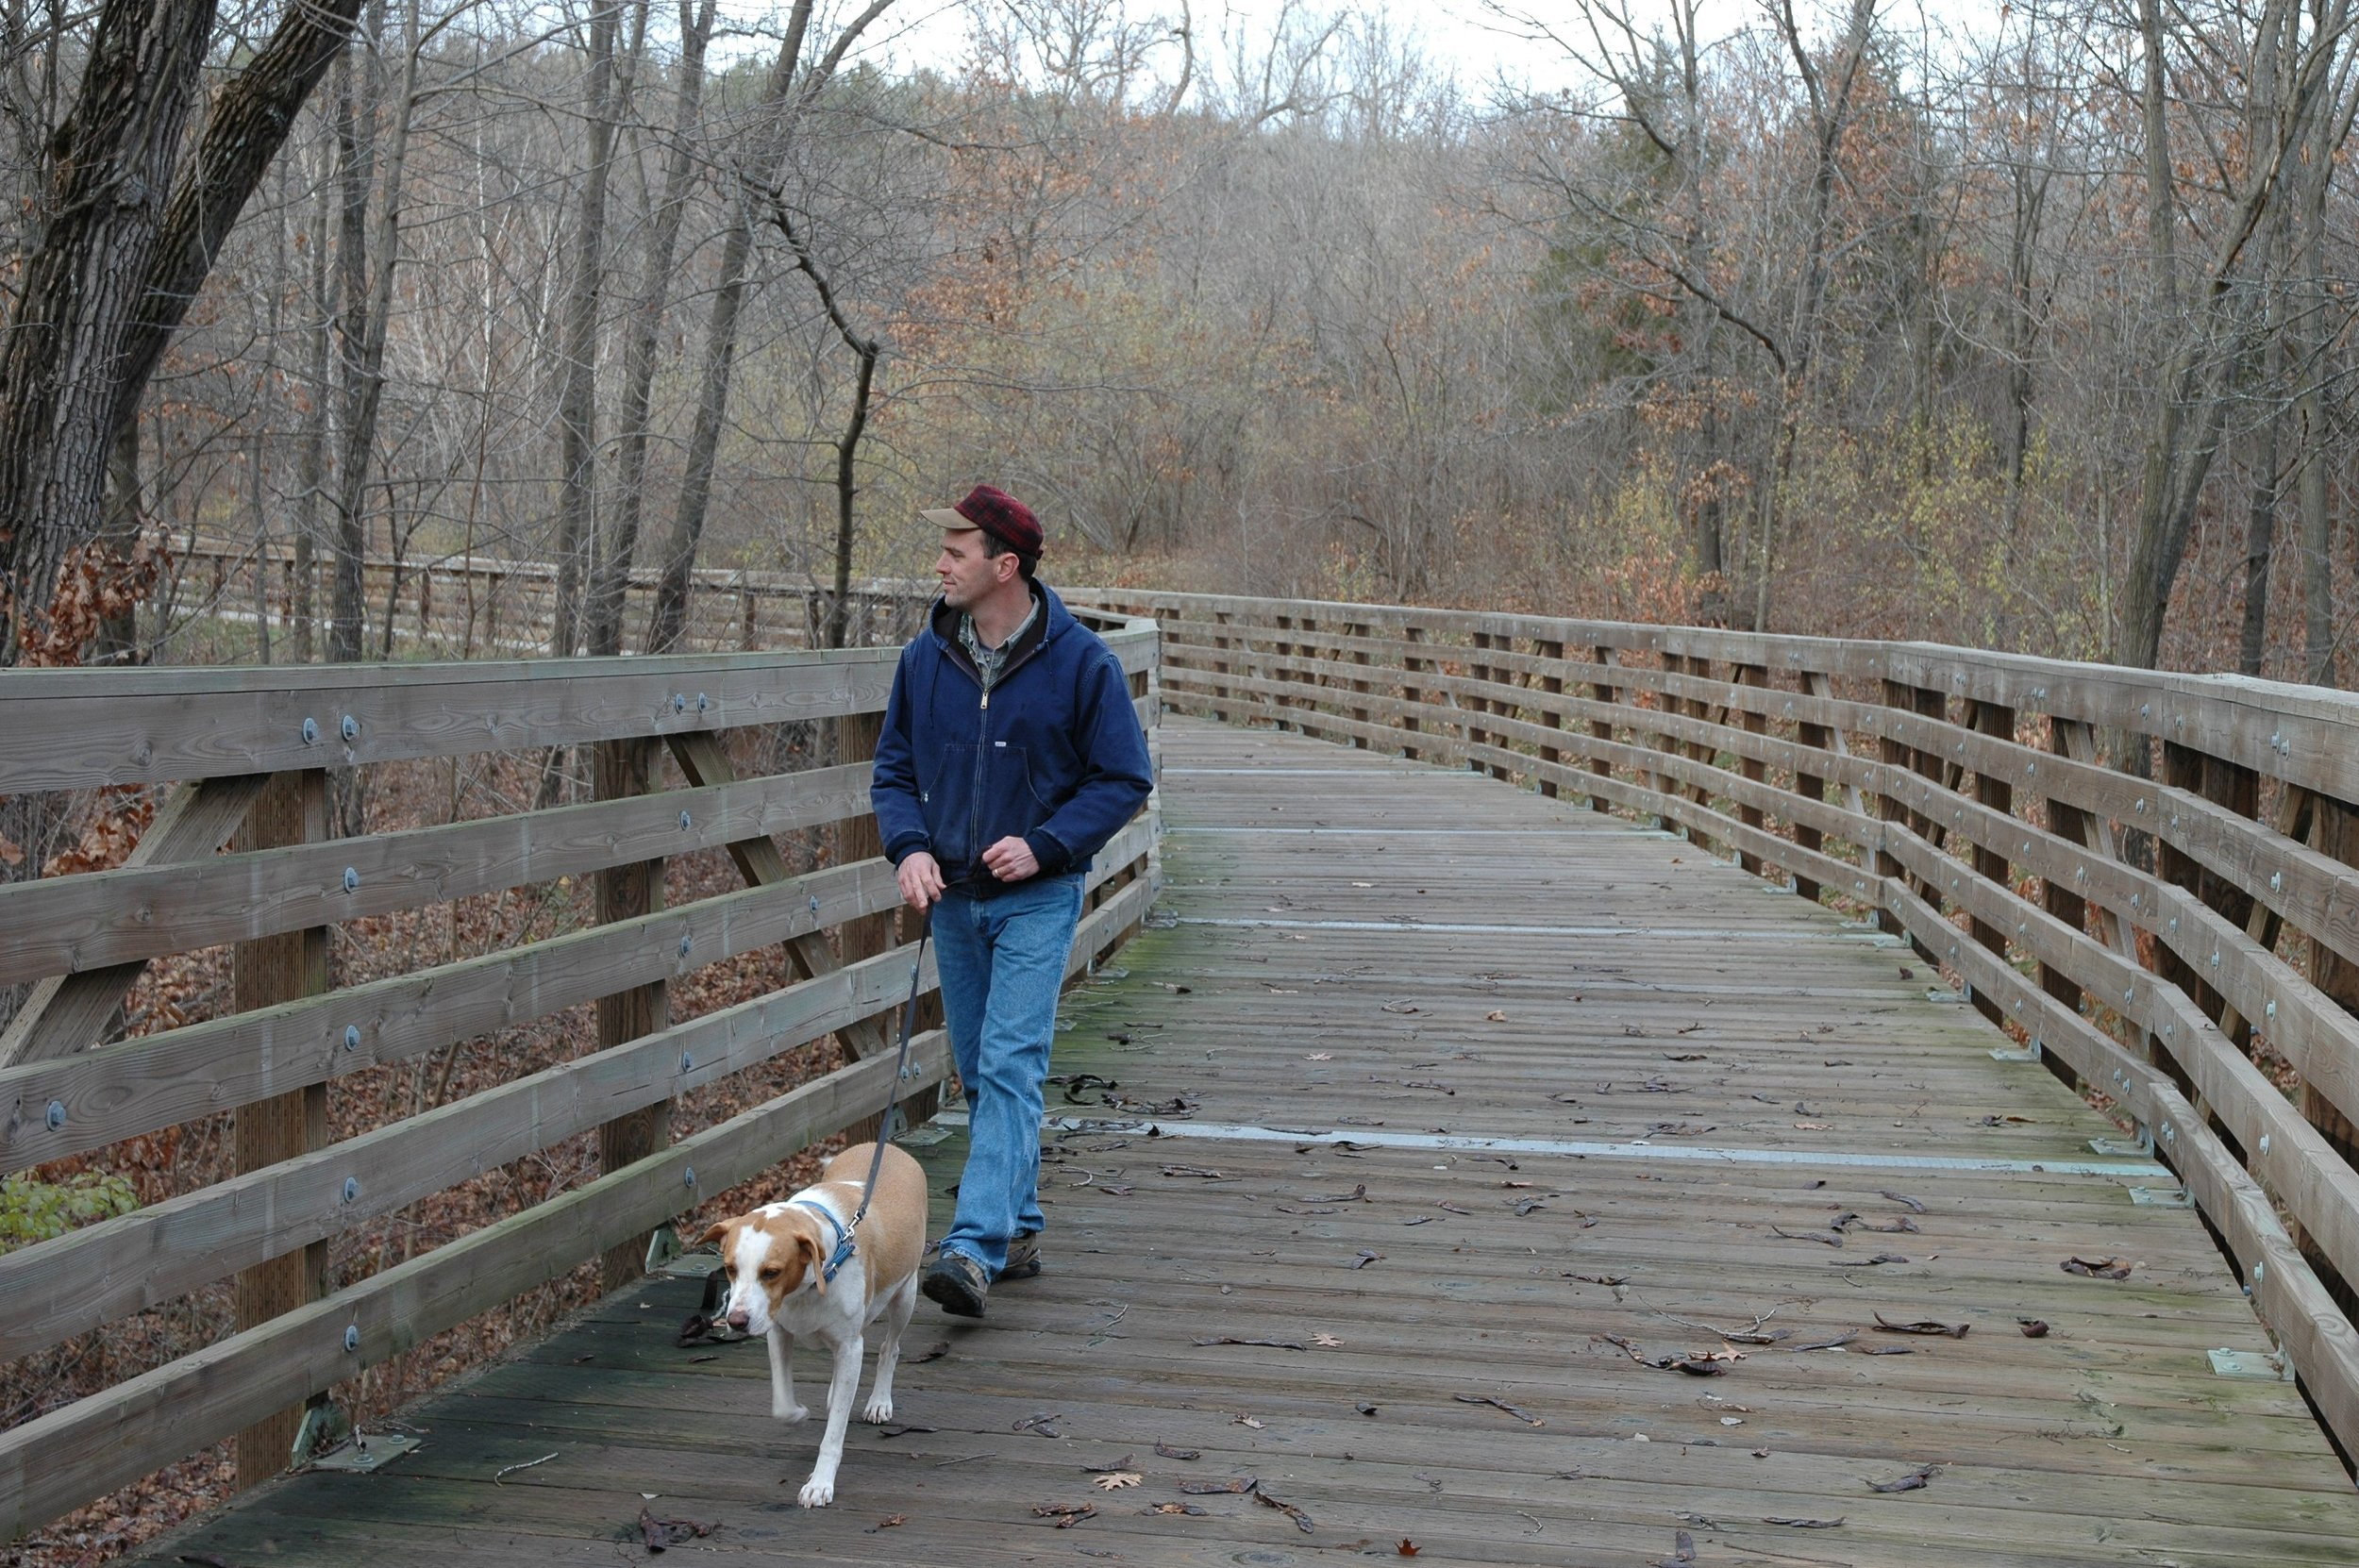 man with dog on trail bridge.jpg